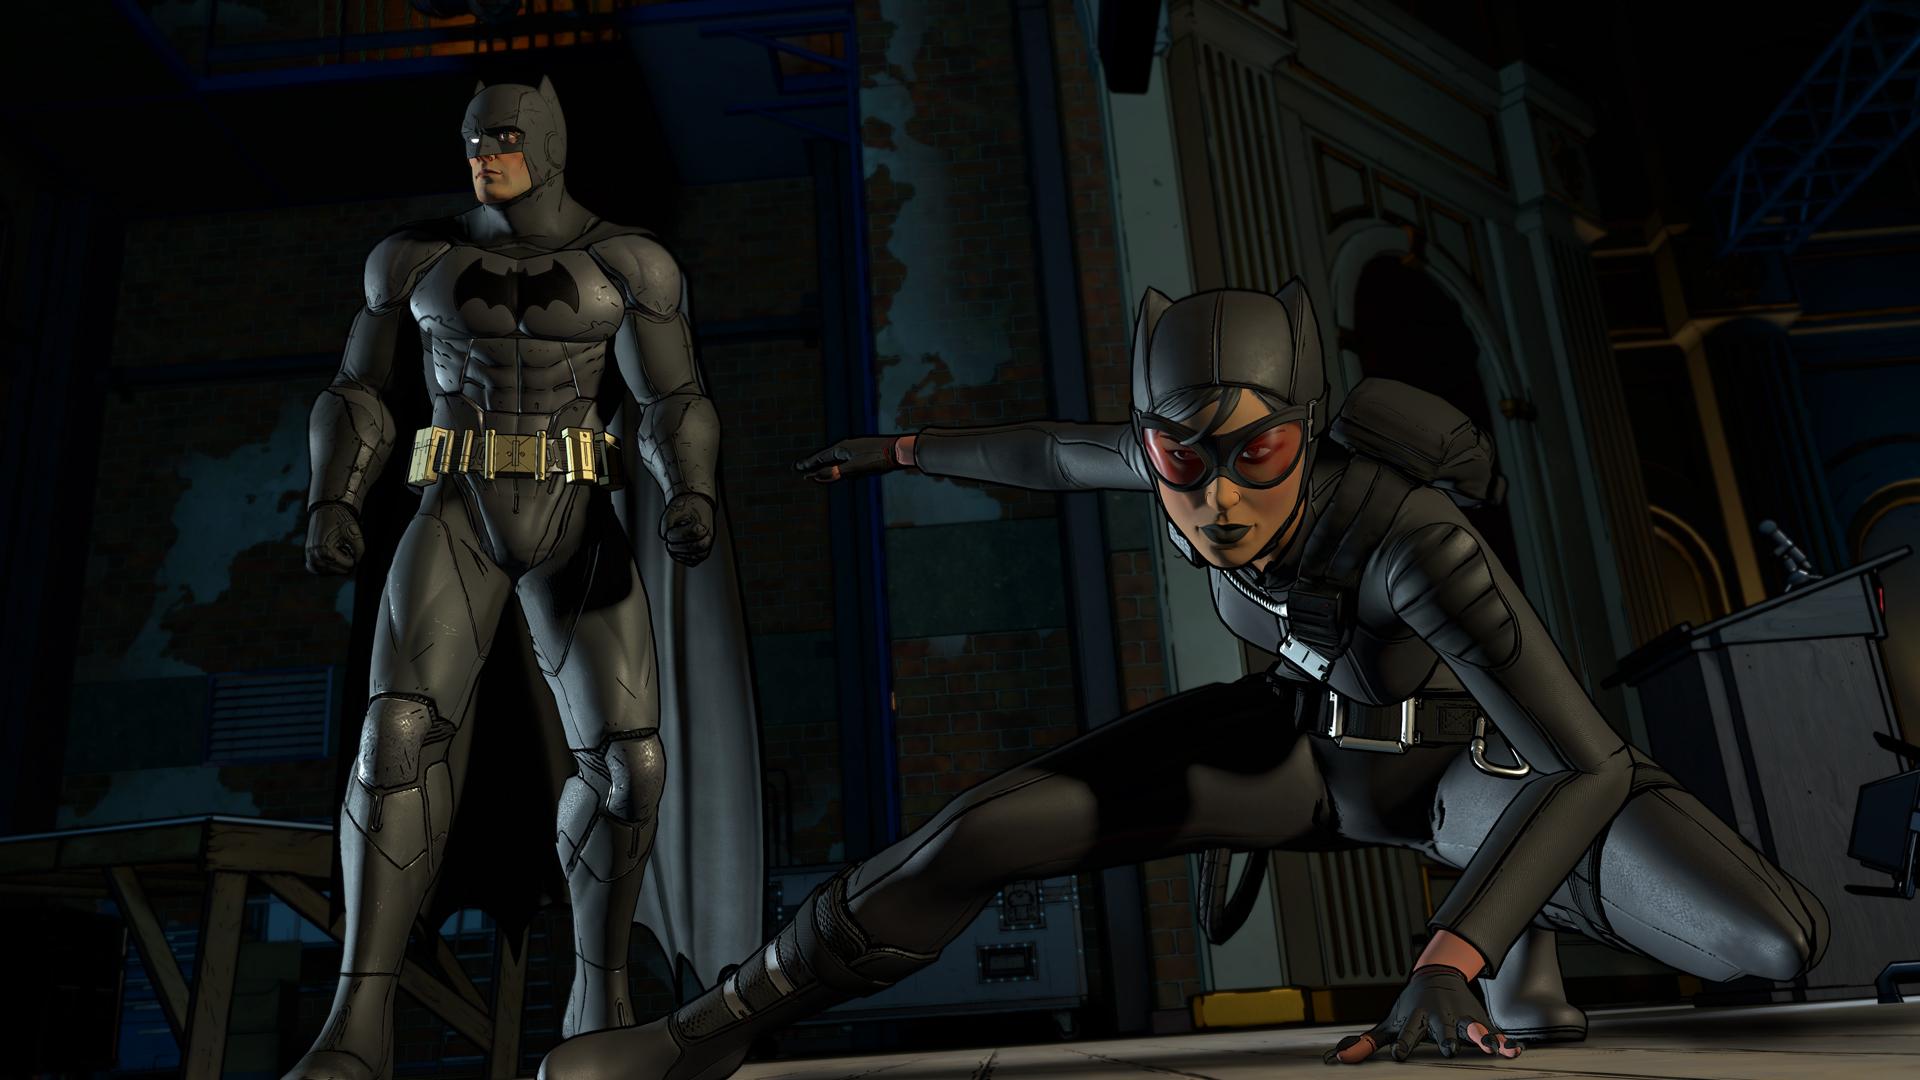 Халява: на PC можно забрать игры про Бэтмена от Telltale